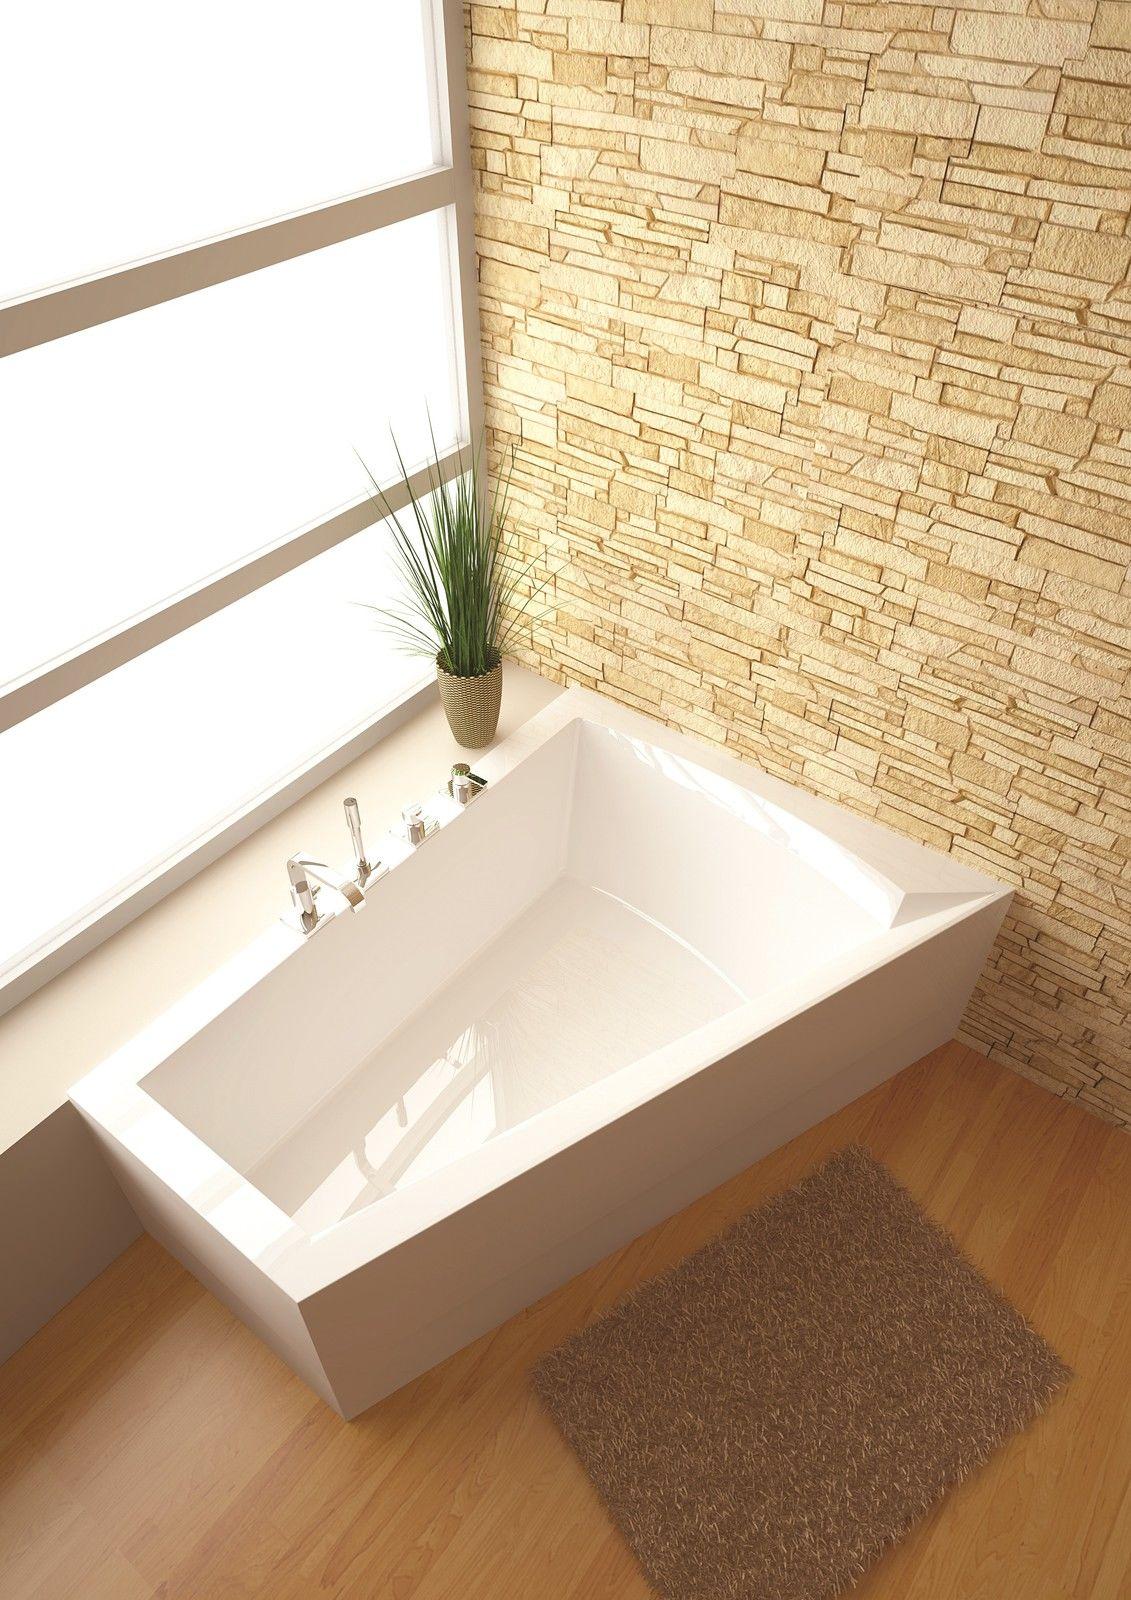 raumspar badewanne galia ii 175 x 135 70 x 52 cm rechts inkl wannentr ger ebay. Black Bedroom Furniture Sets. Home Design Ideas